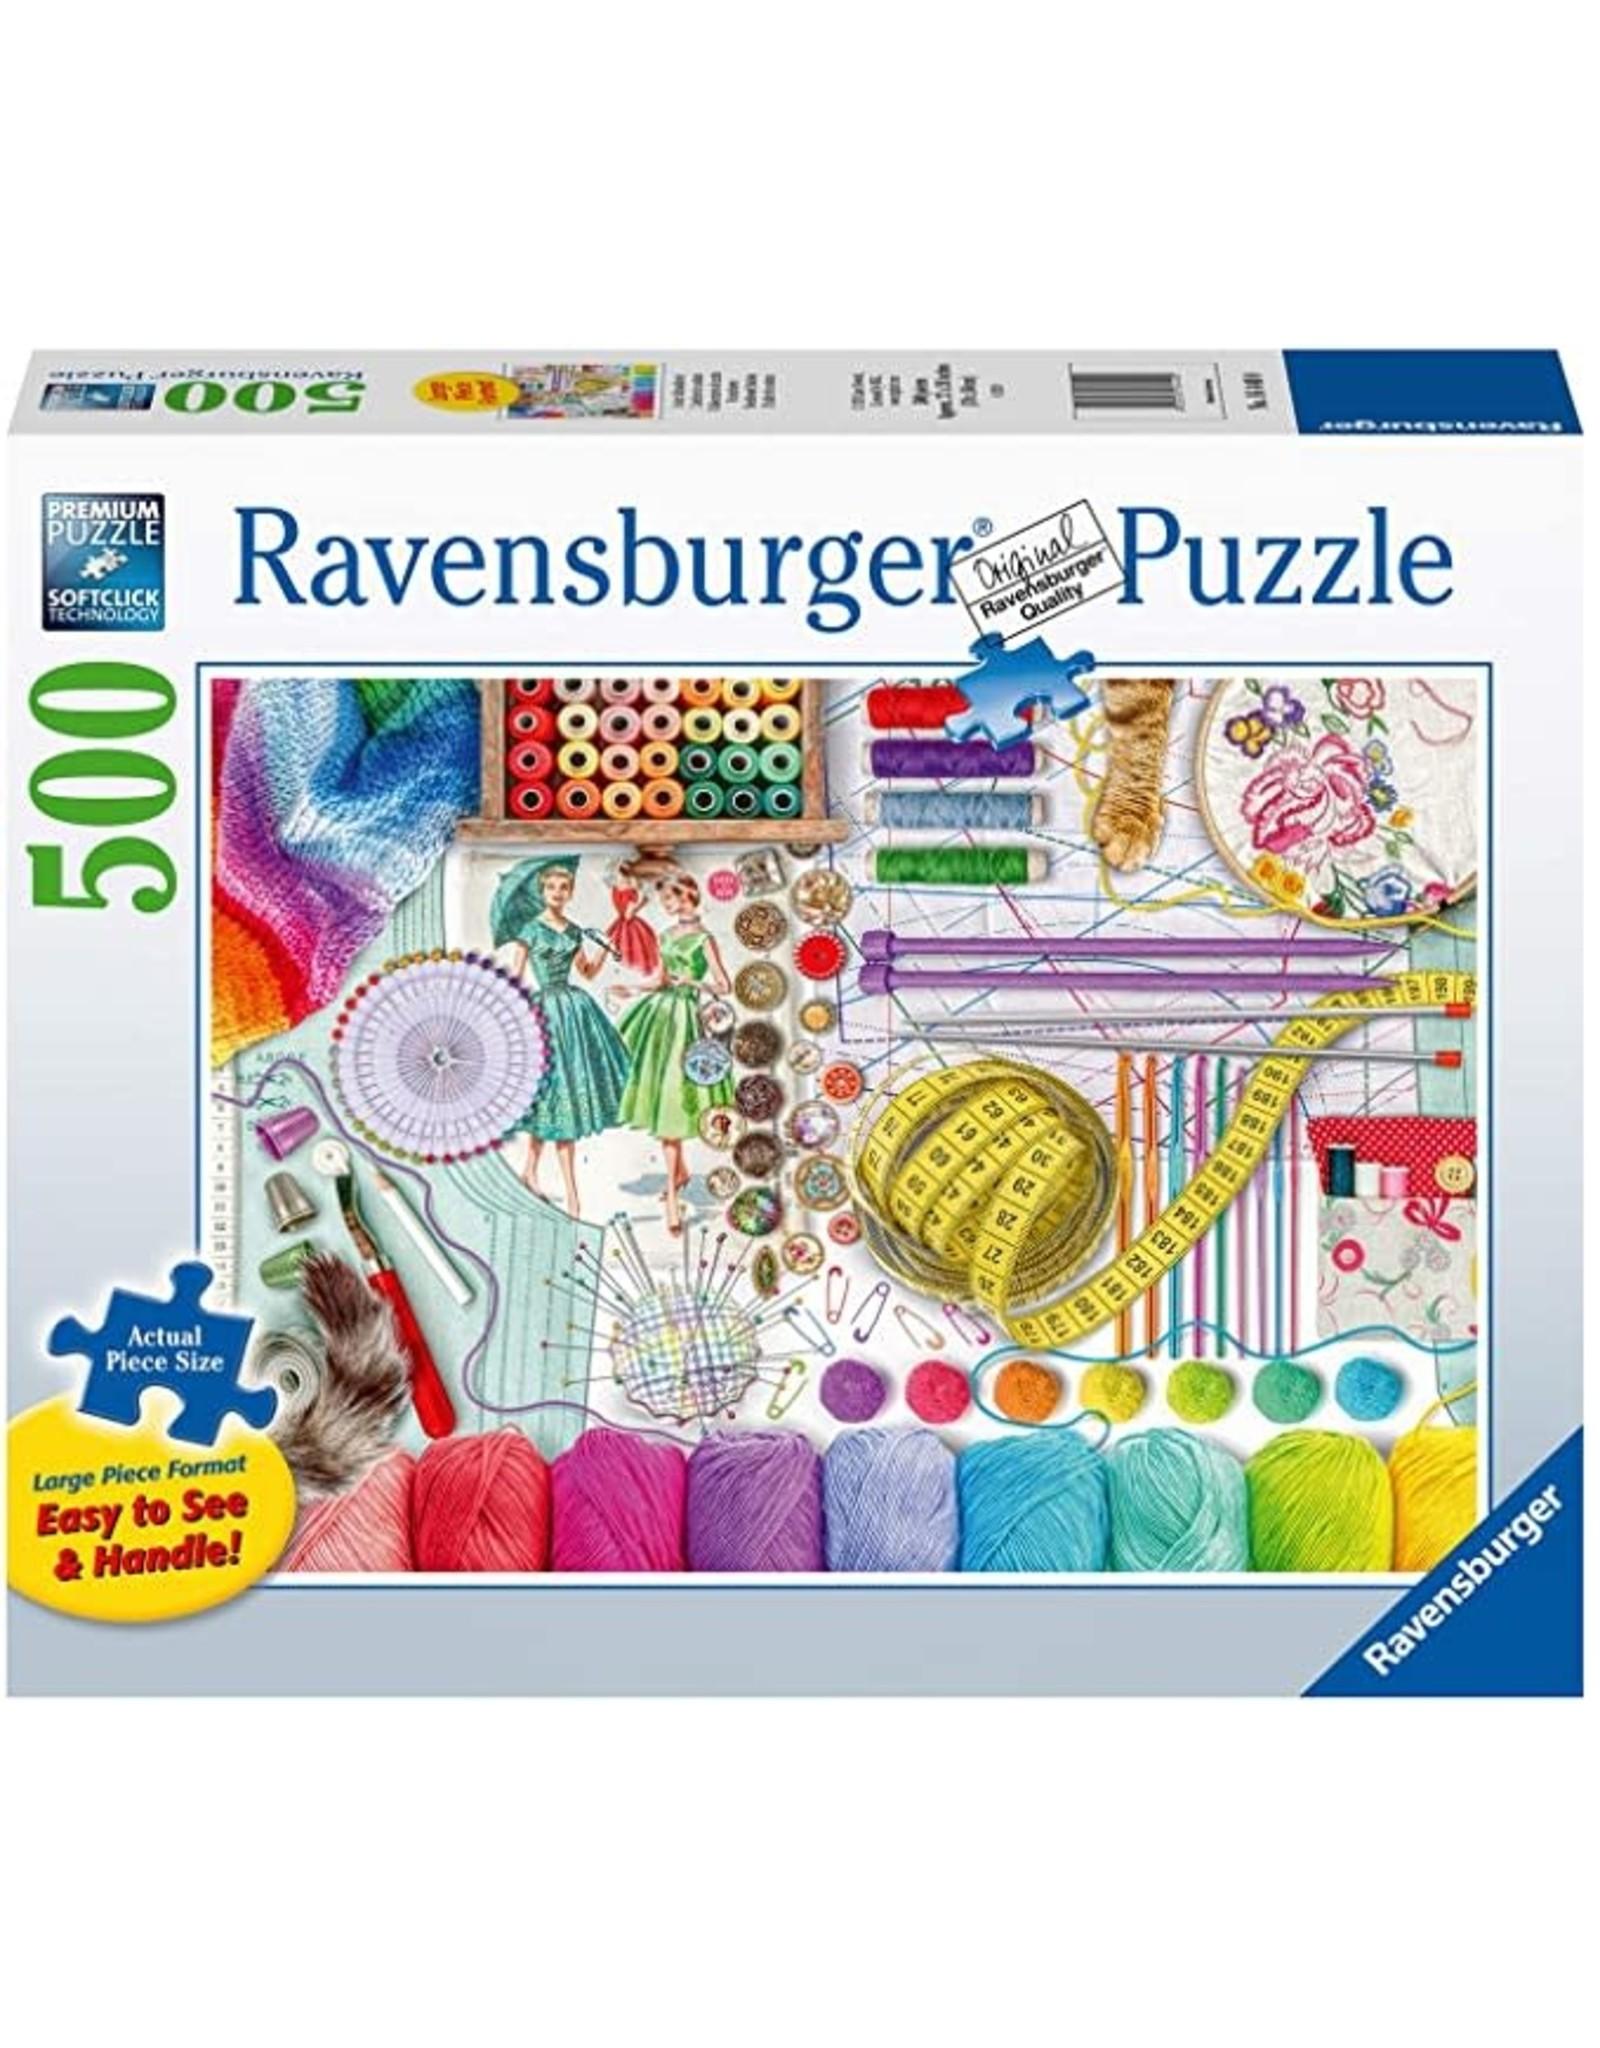 Ravensburger Needlework Station 500 pc